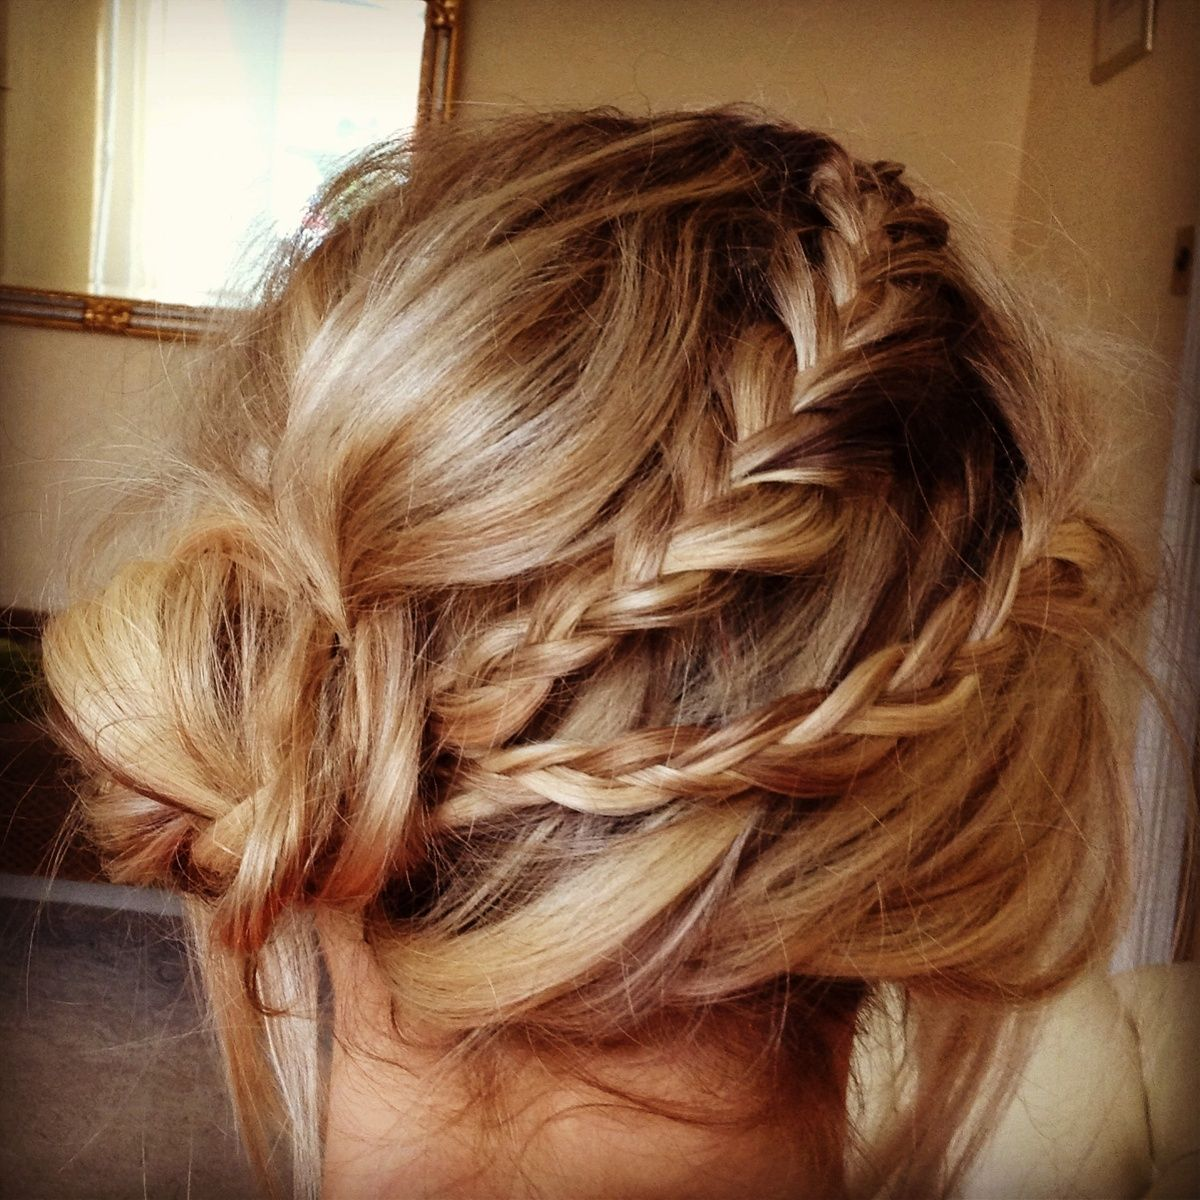 41+ Hair coiffure des idees